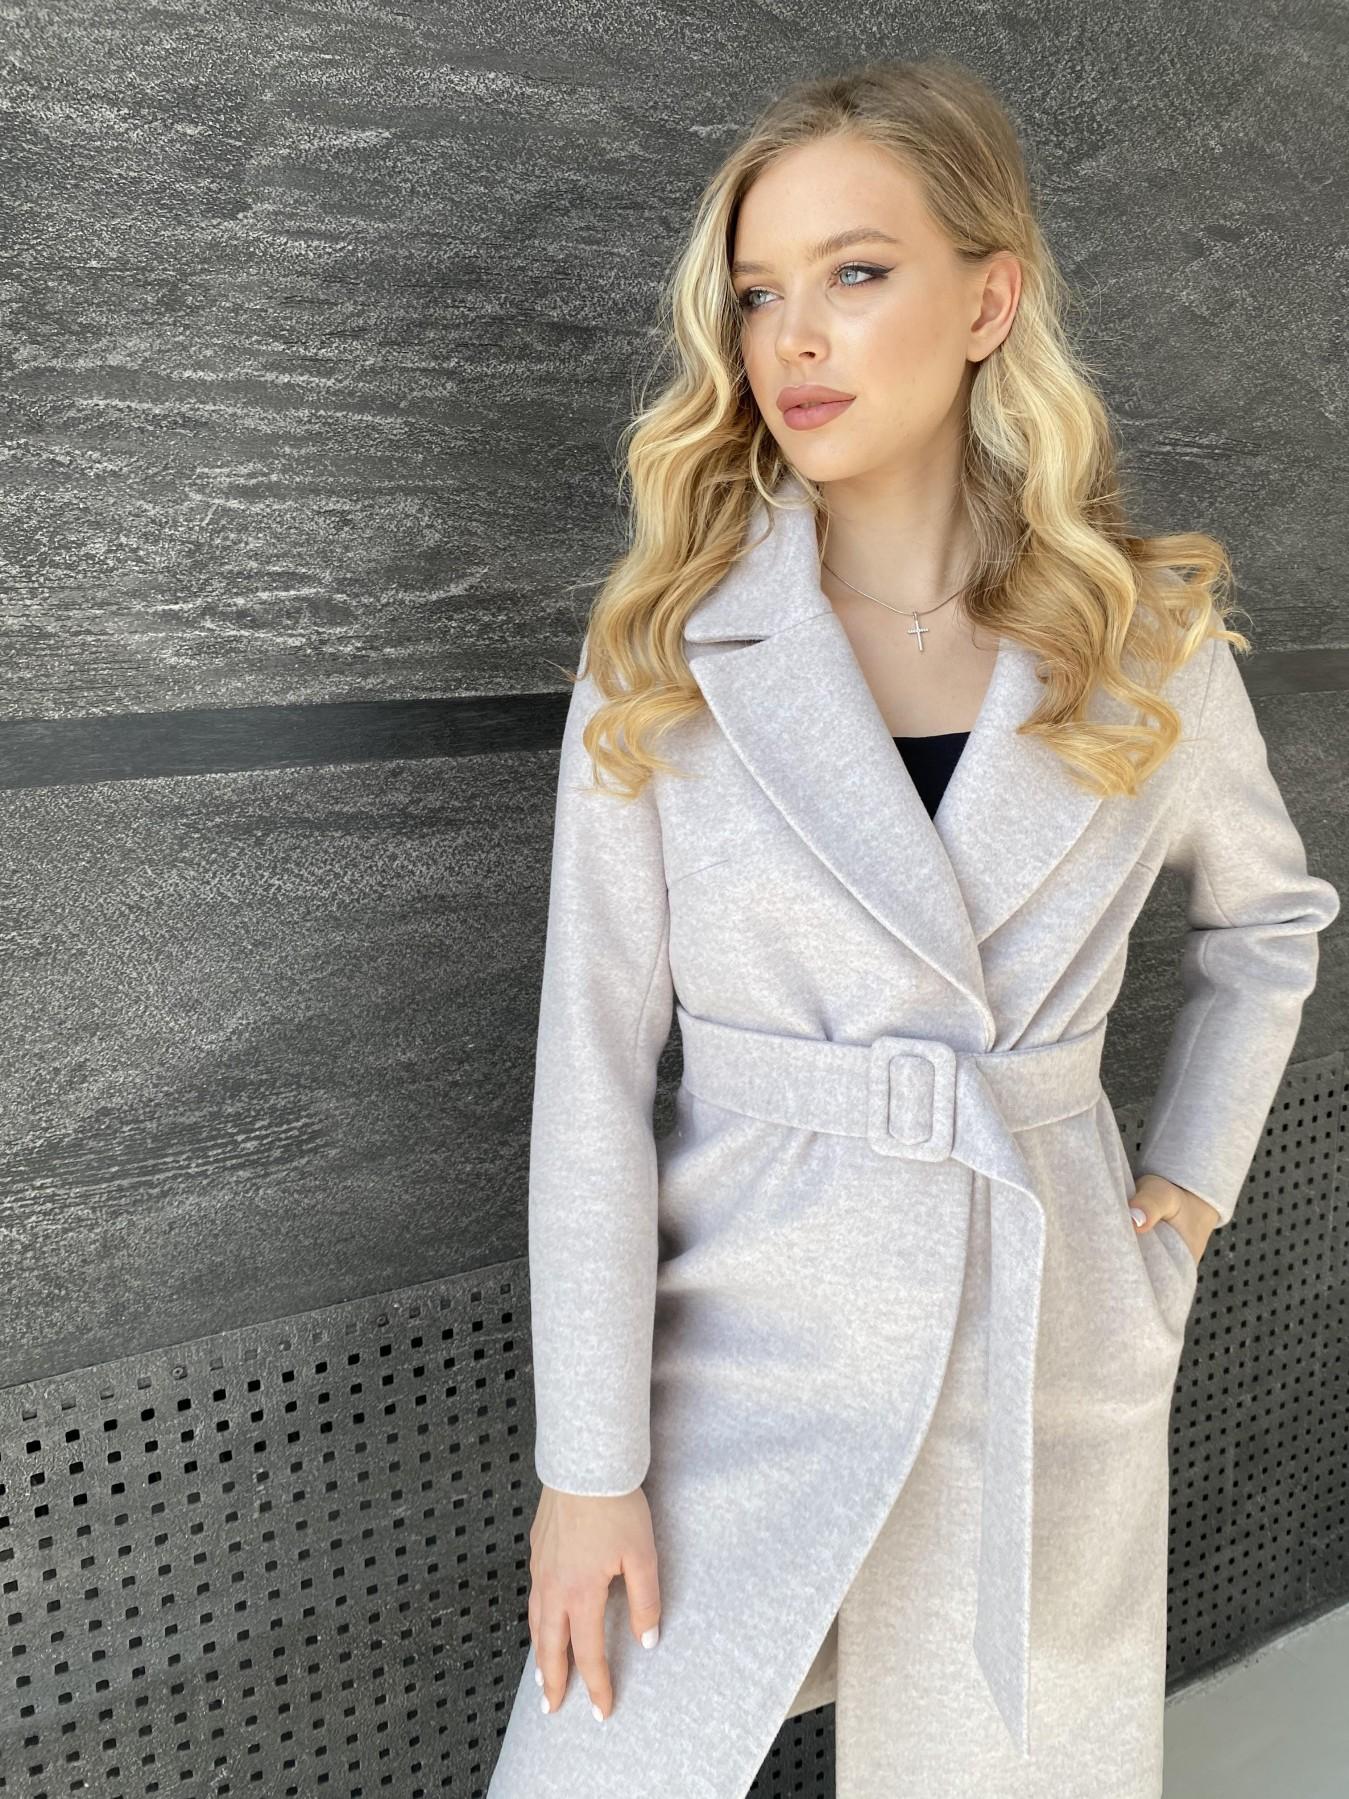 Севен пальто меланж  из кашемира 10625 АРТ. 47160 Цвет: Бежевый меланж - фото 2, интернет магазин tm-modus.ru